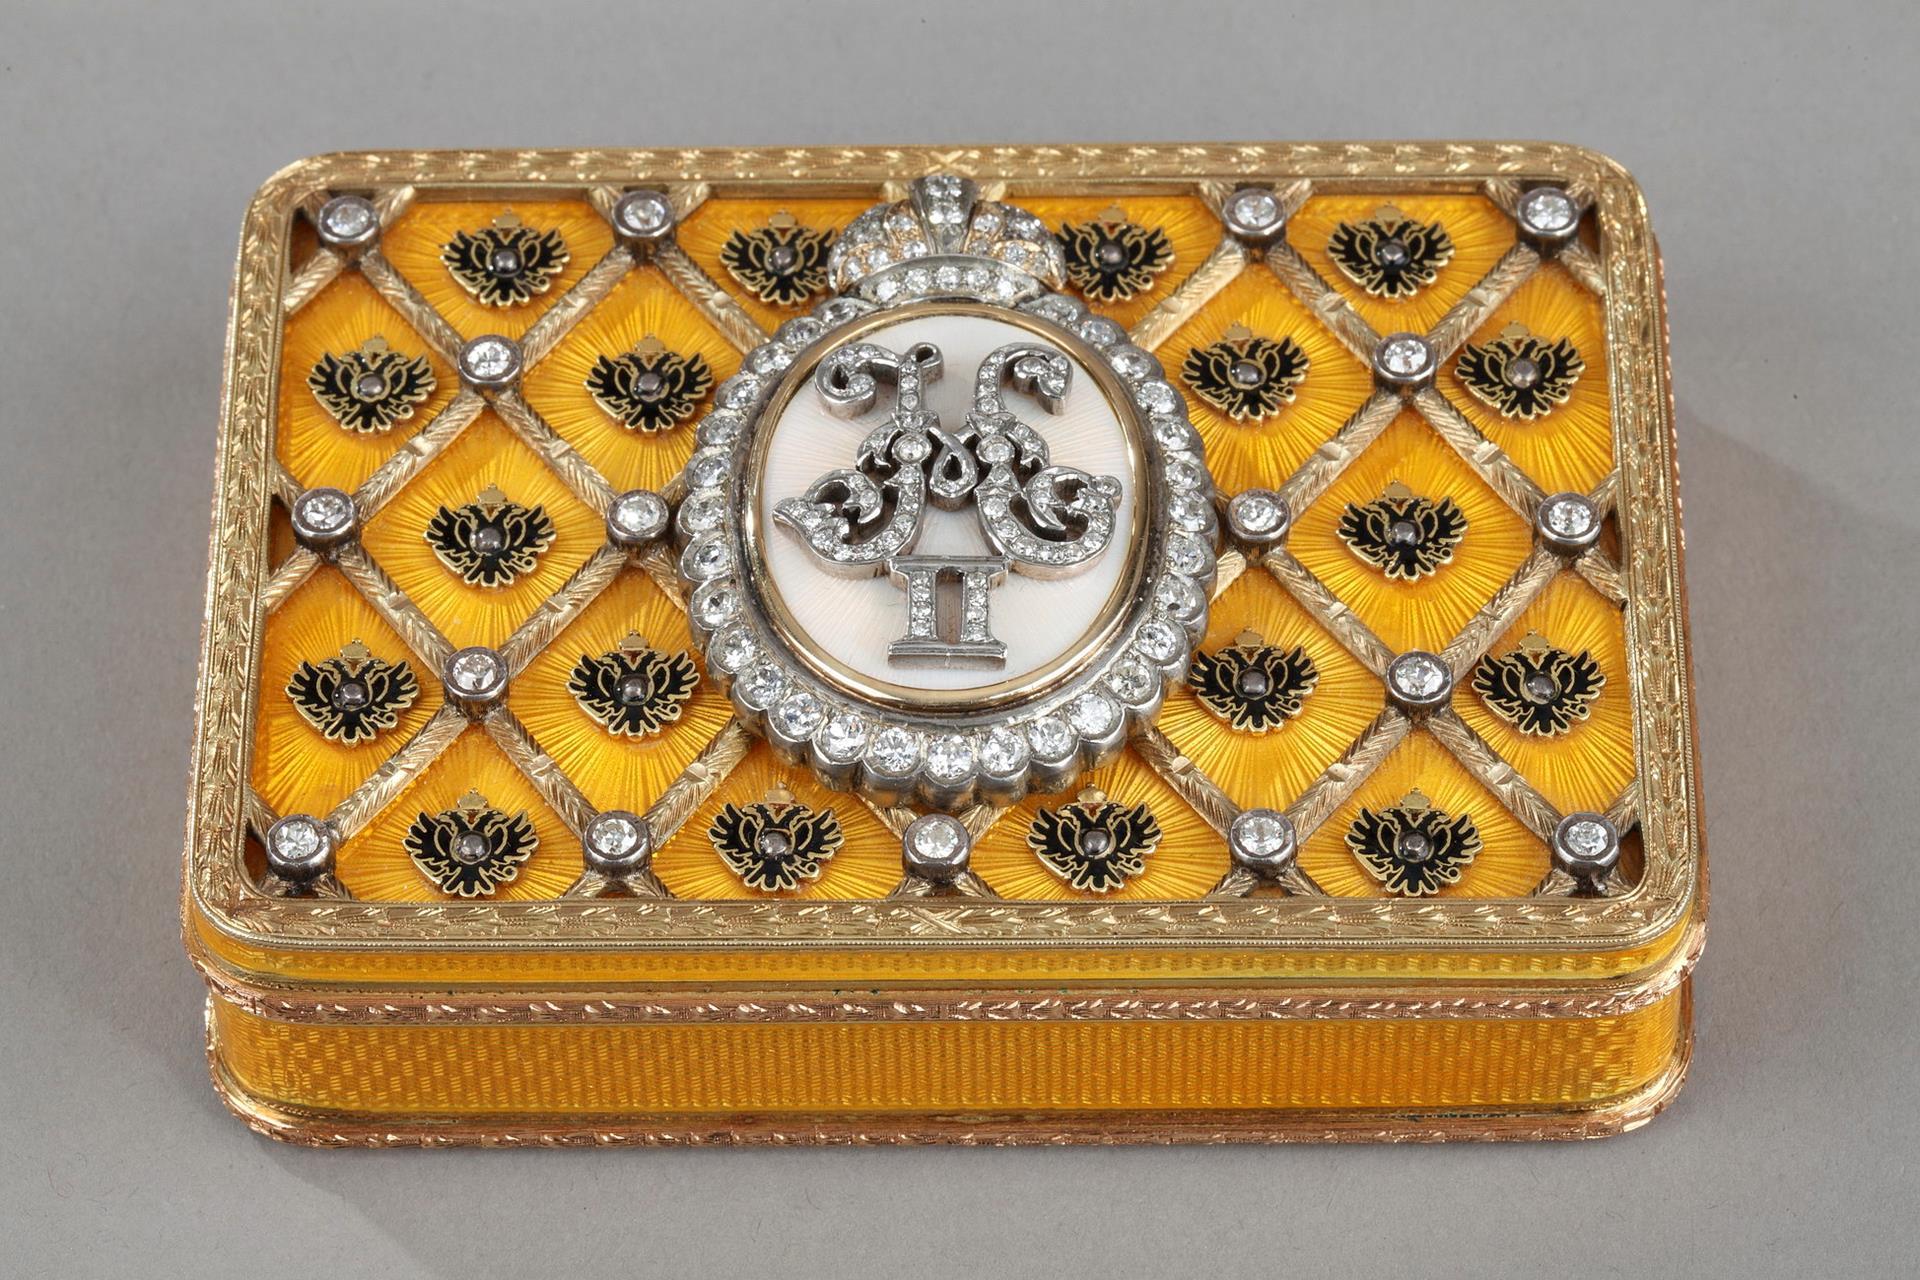 Tsar Nicholas II coronation snuff box. In homage to FABERGE. Early 20th century.